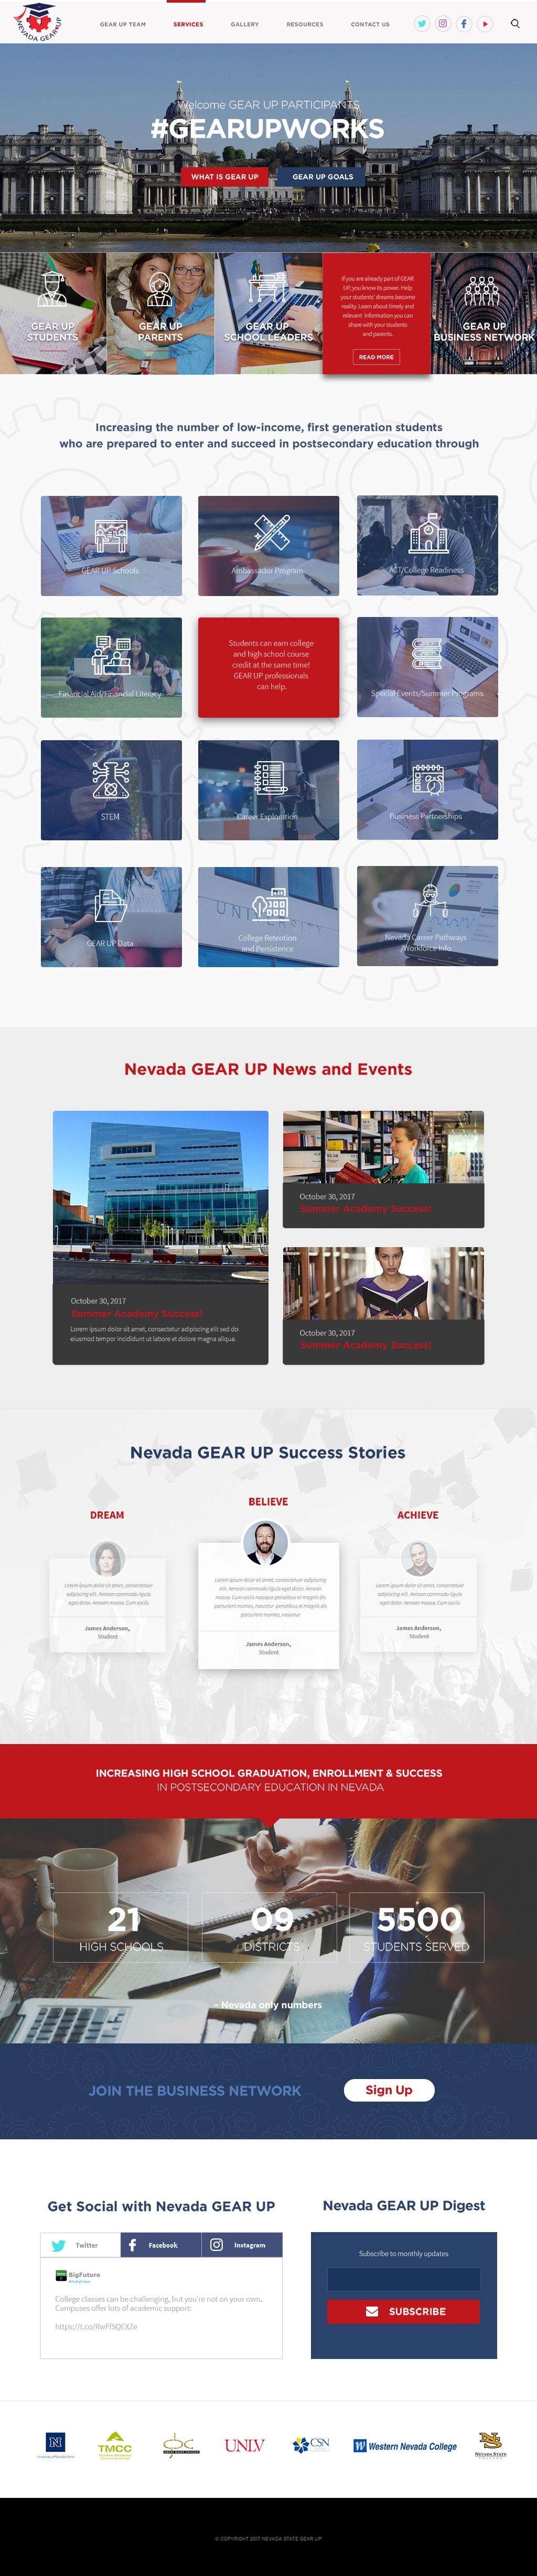 Nevada GEAR UP